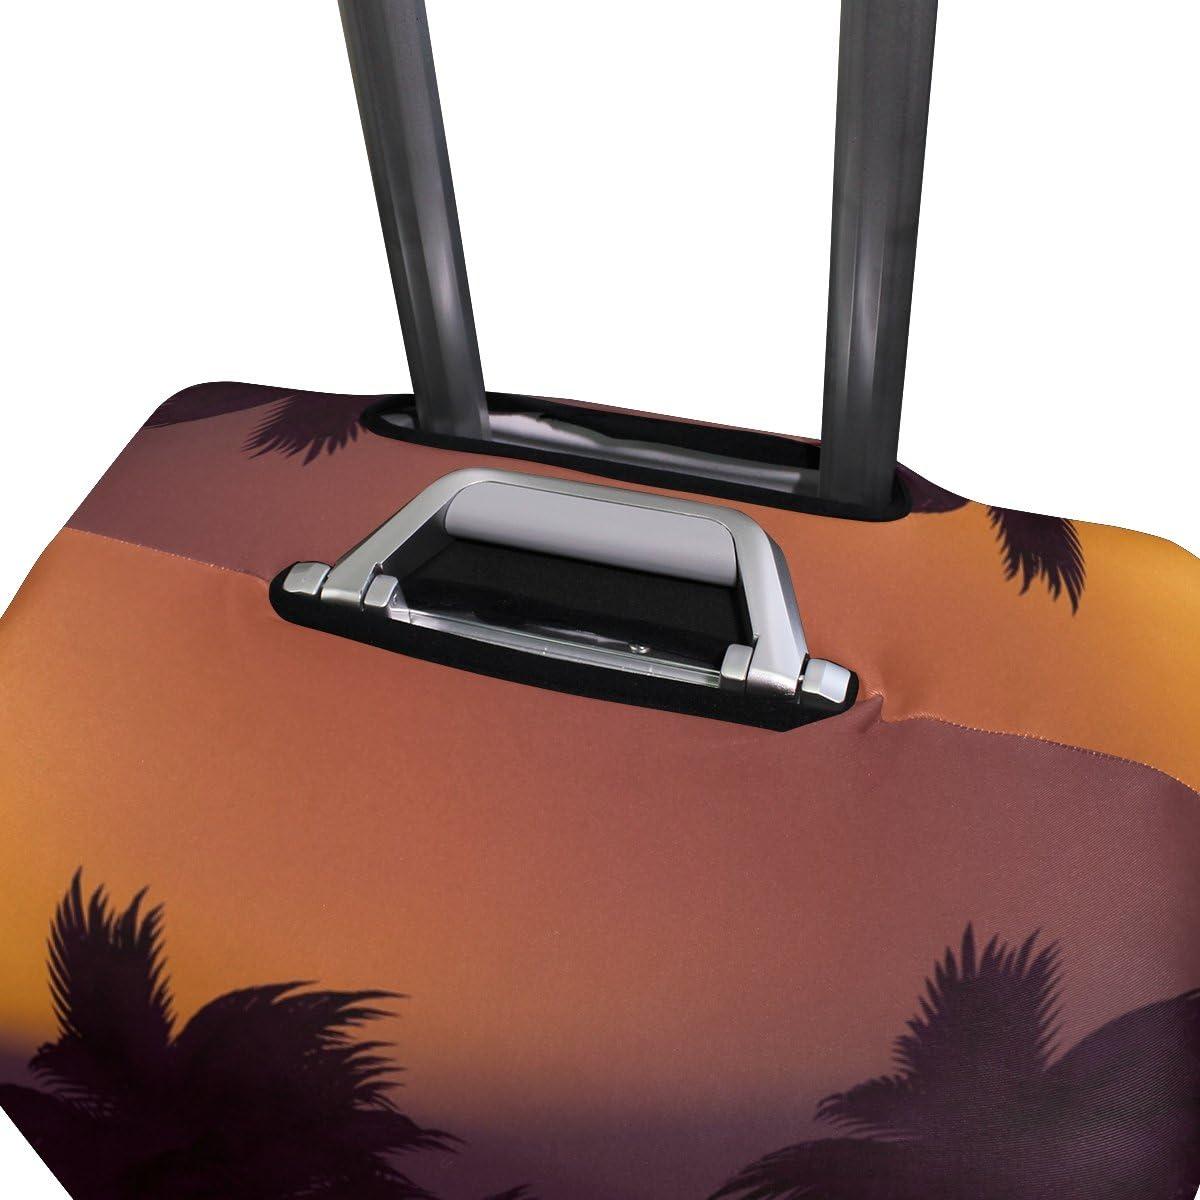 OREZI 3D Island Palm Tree Luggage Protector Suitcase Cover 18-32 Inch